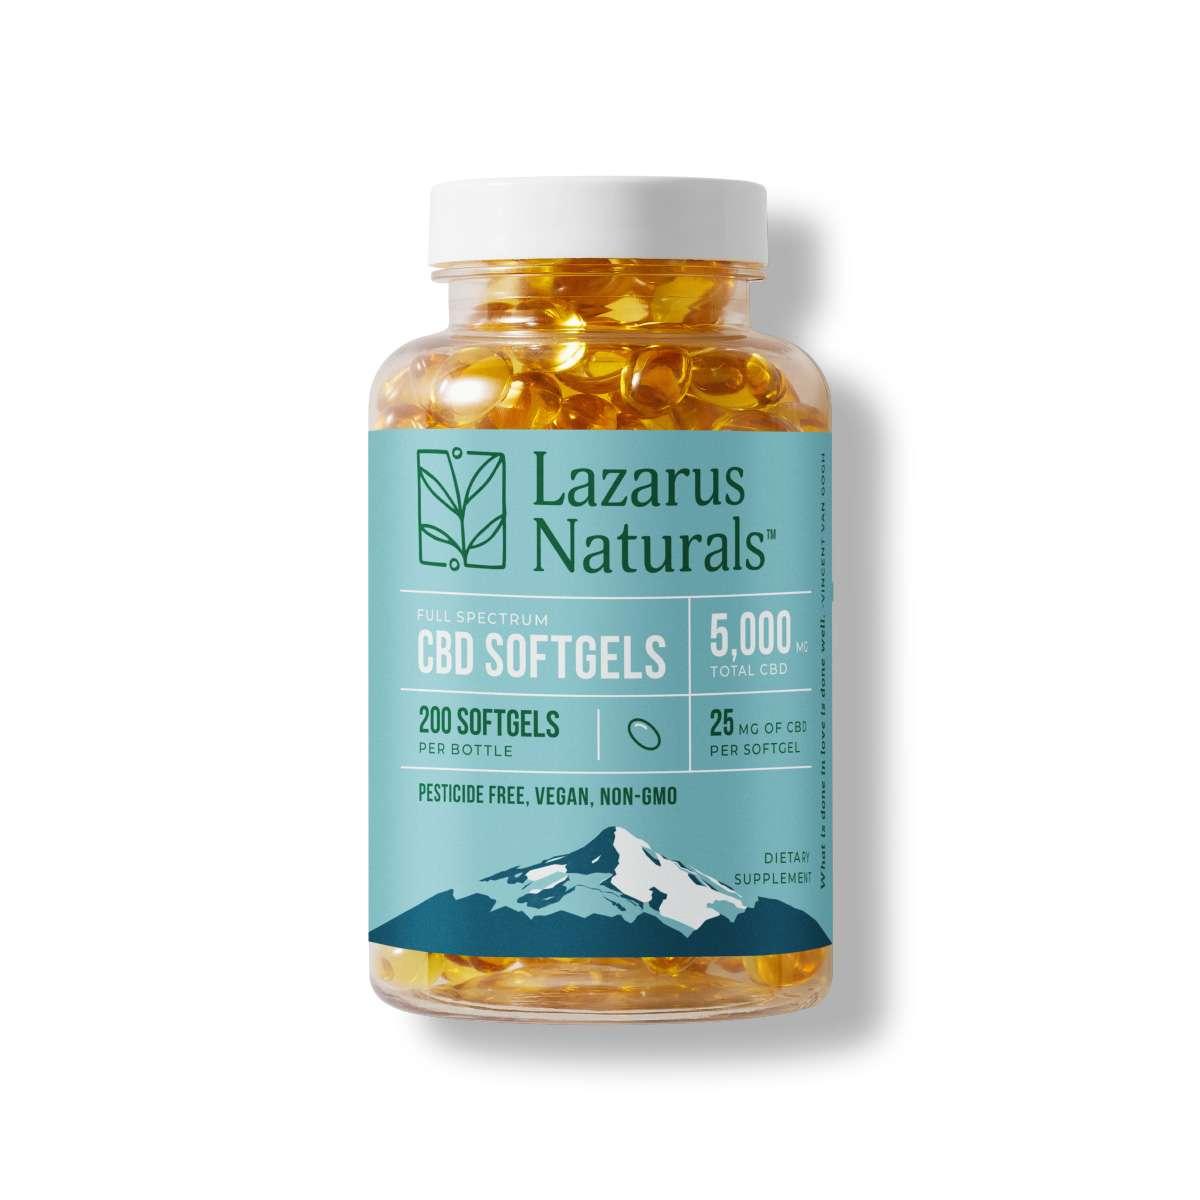 Lazarus Naturals, 25mg Full Spectrum CBD Softgels, 200ct, 5000mg of CBD